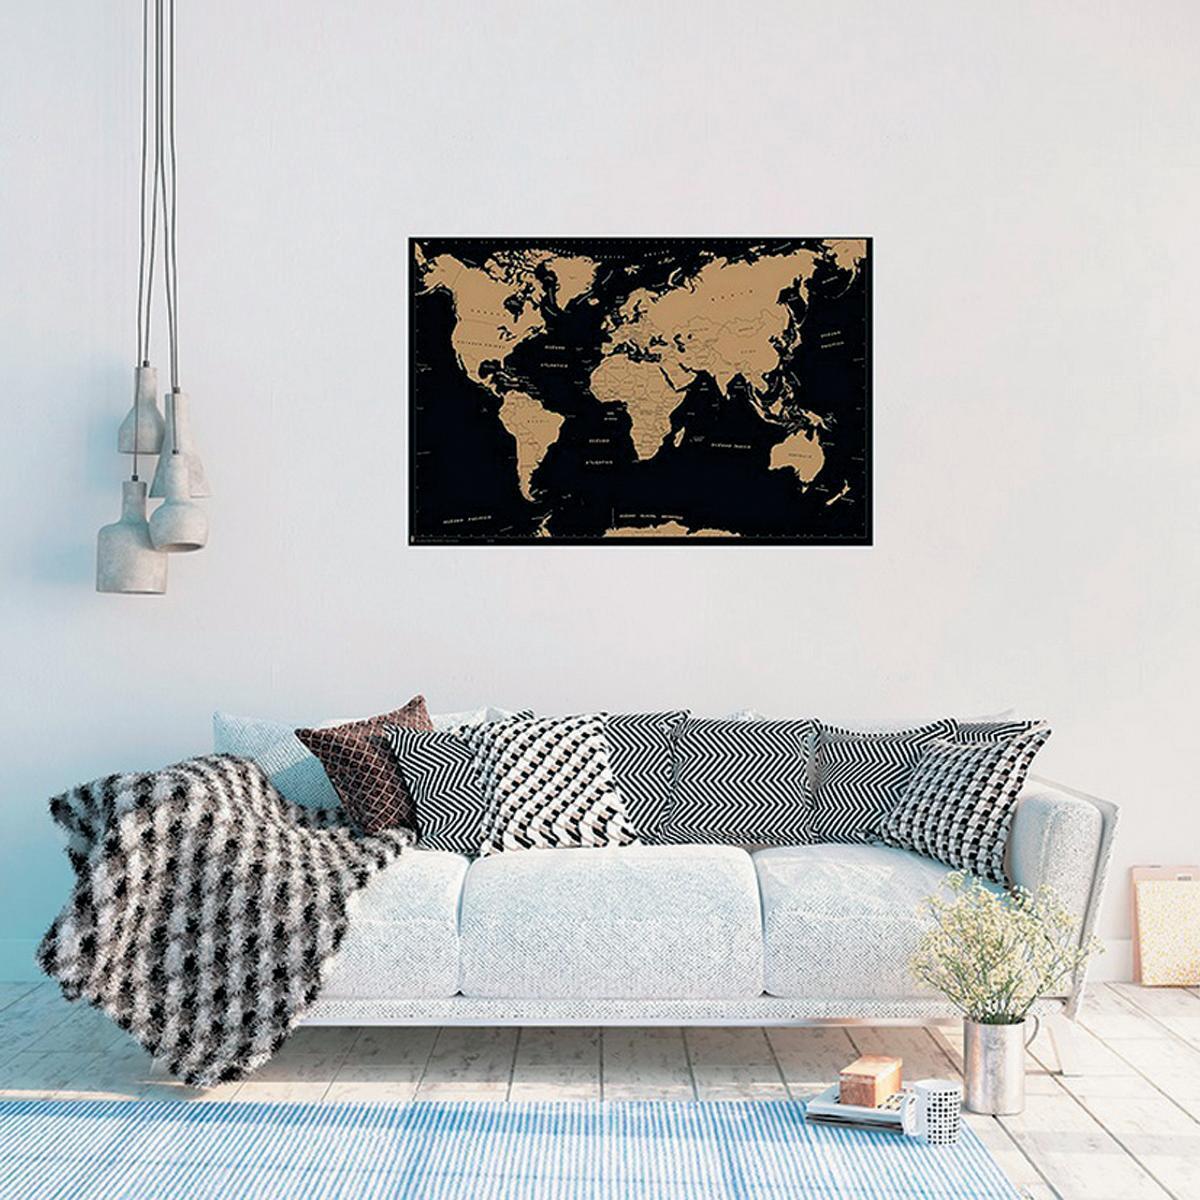 Poster Mappamondo 91.5x61 cm - 2